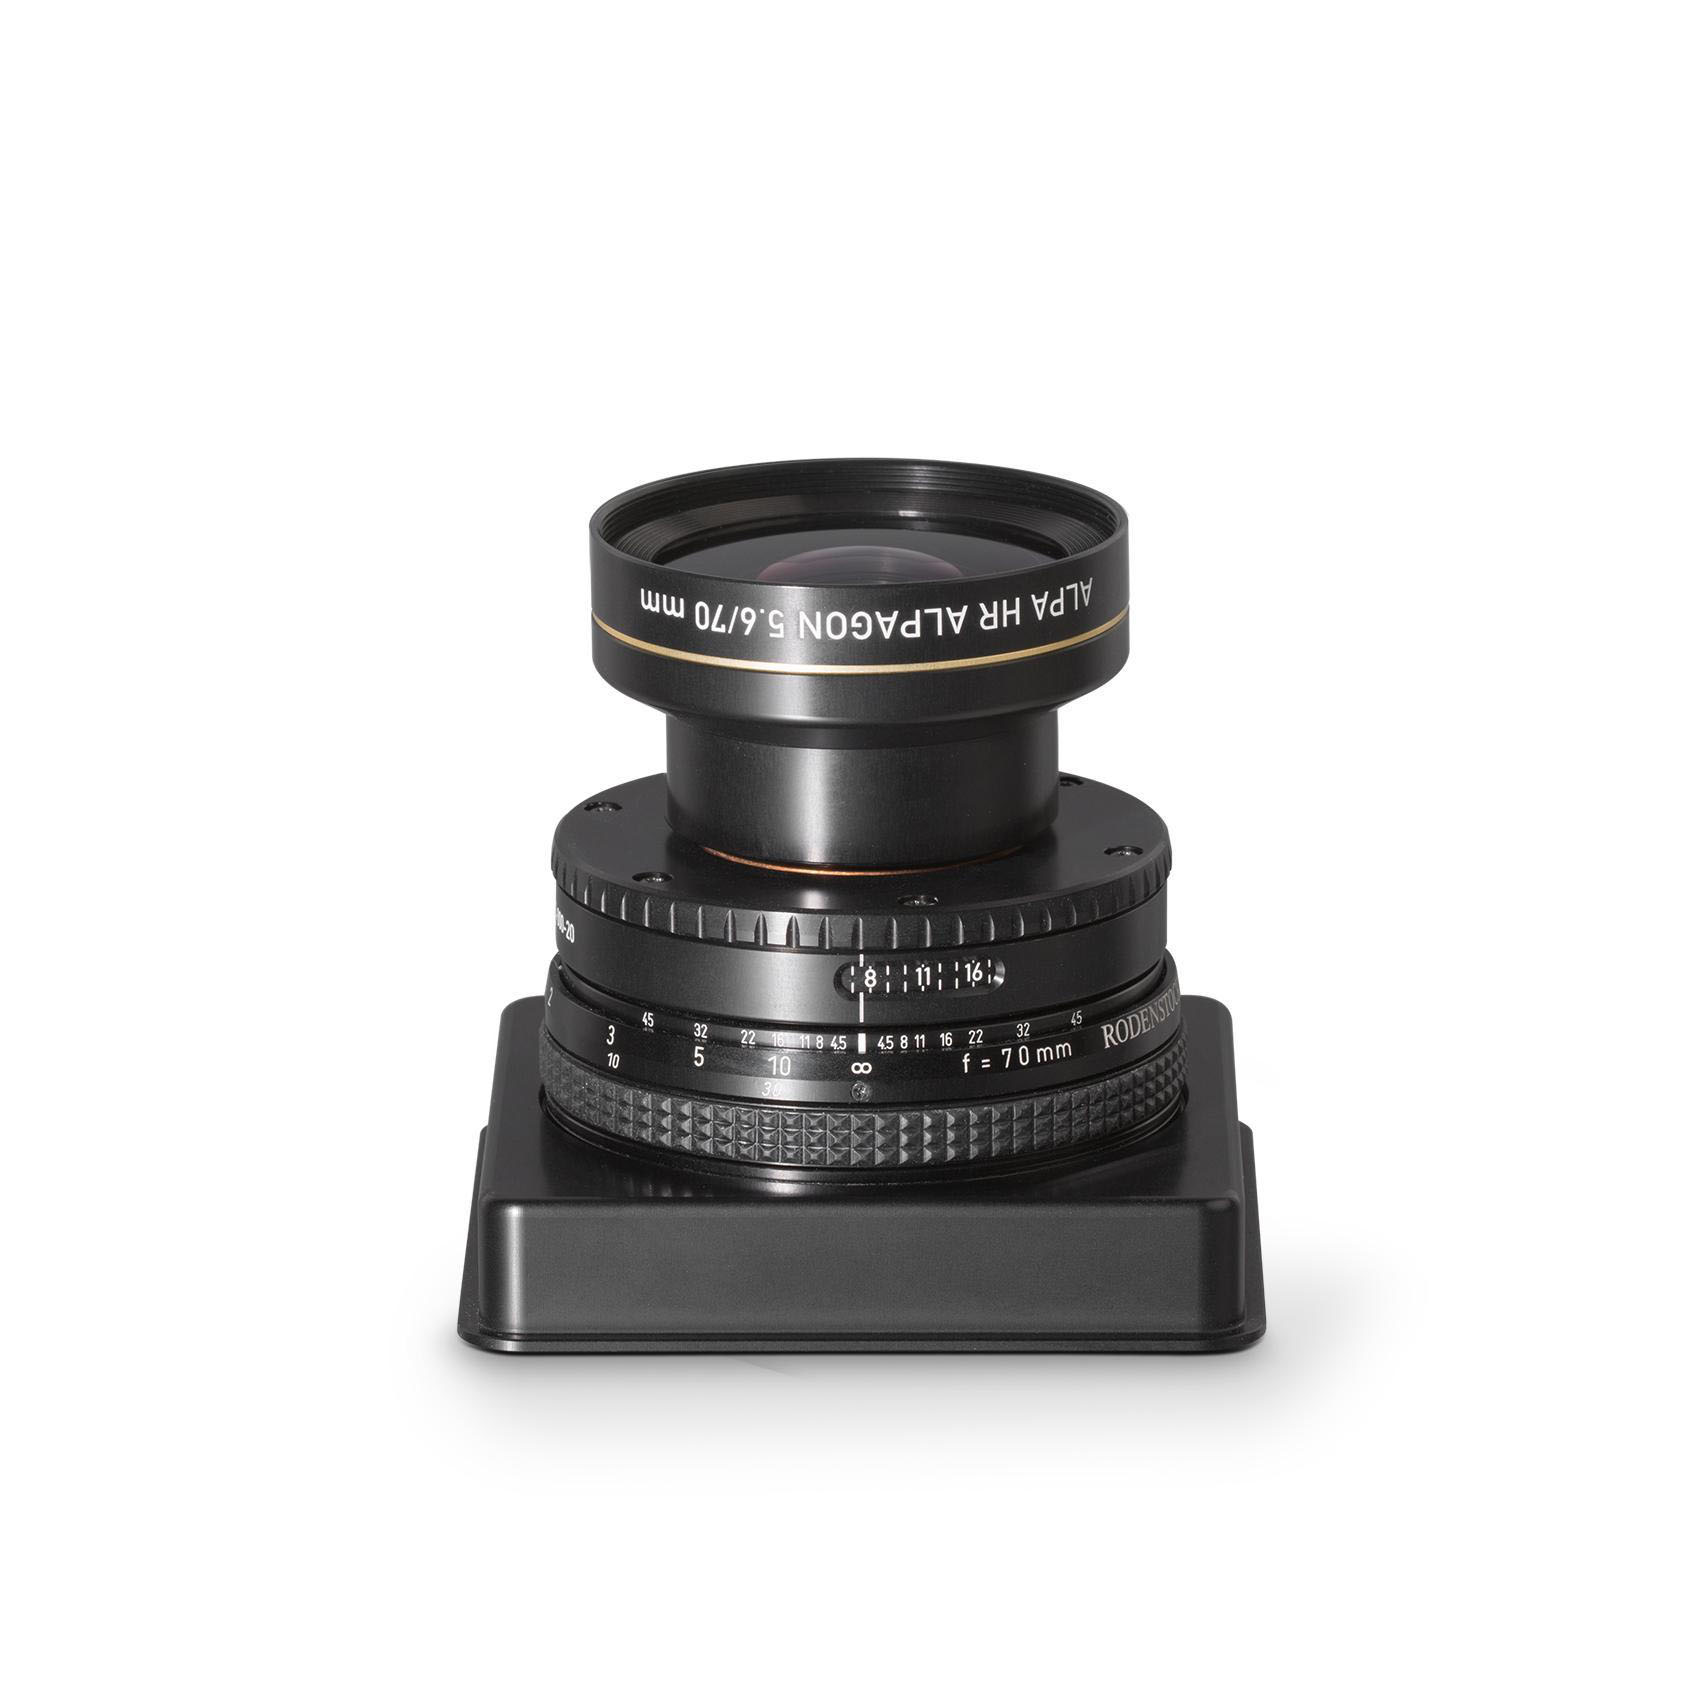 Rodenstock / ALPA HR Alpagon 5.6/70 mm, FPS SB17, in Aperture Unit